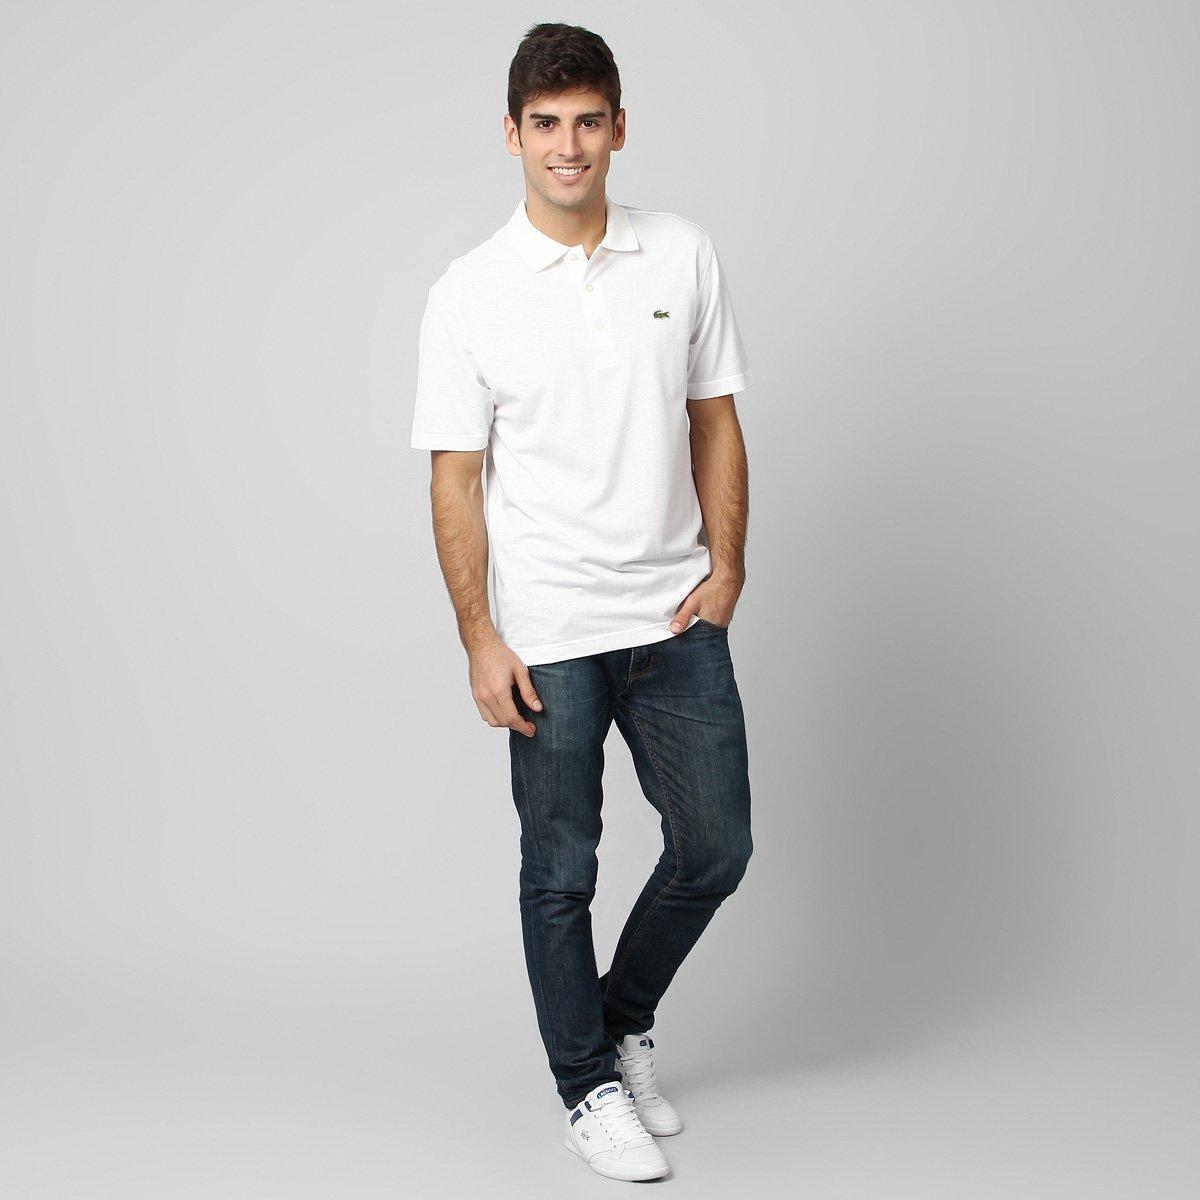 Camisa Polo Lacoste Super Light Masculina - Branco - Compre Agora ... ac6f85e1ce